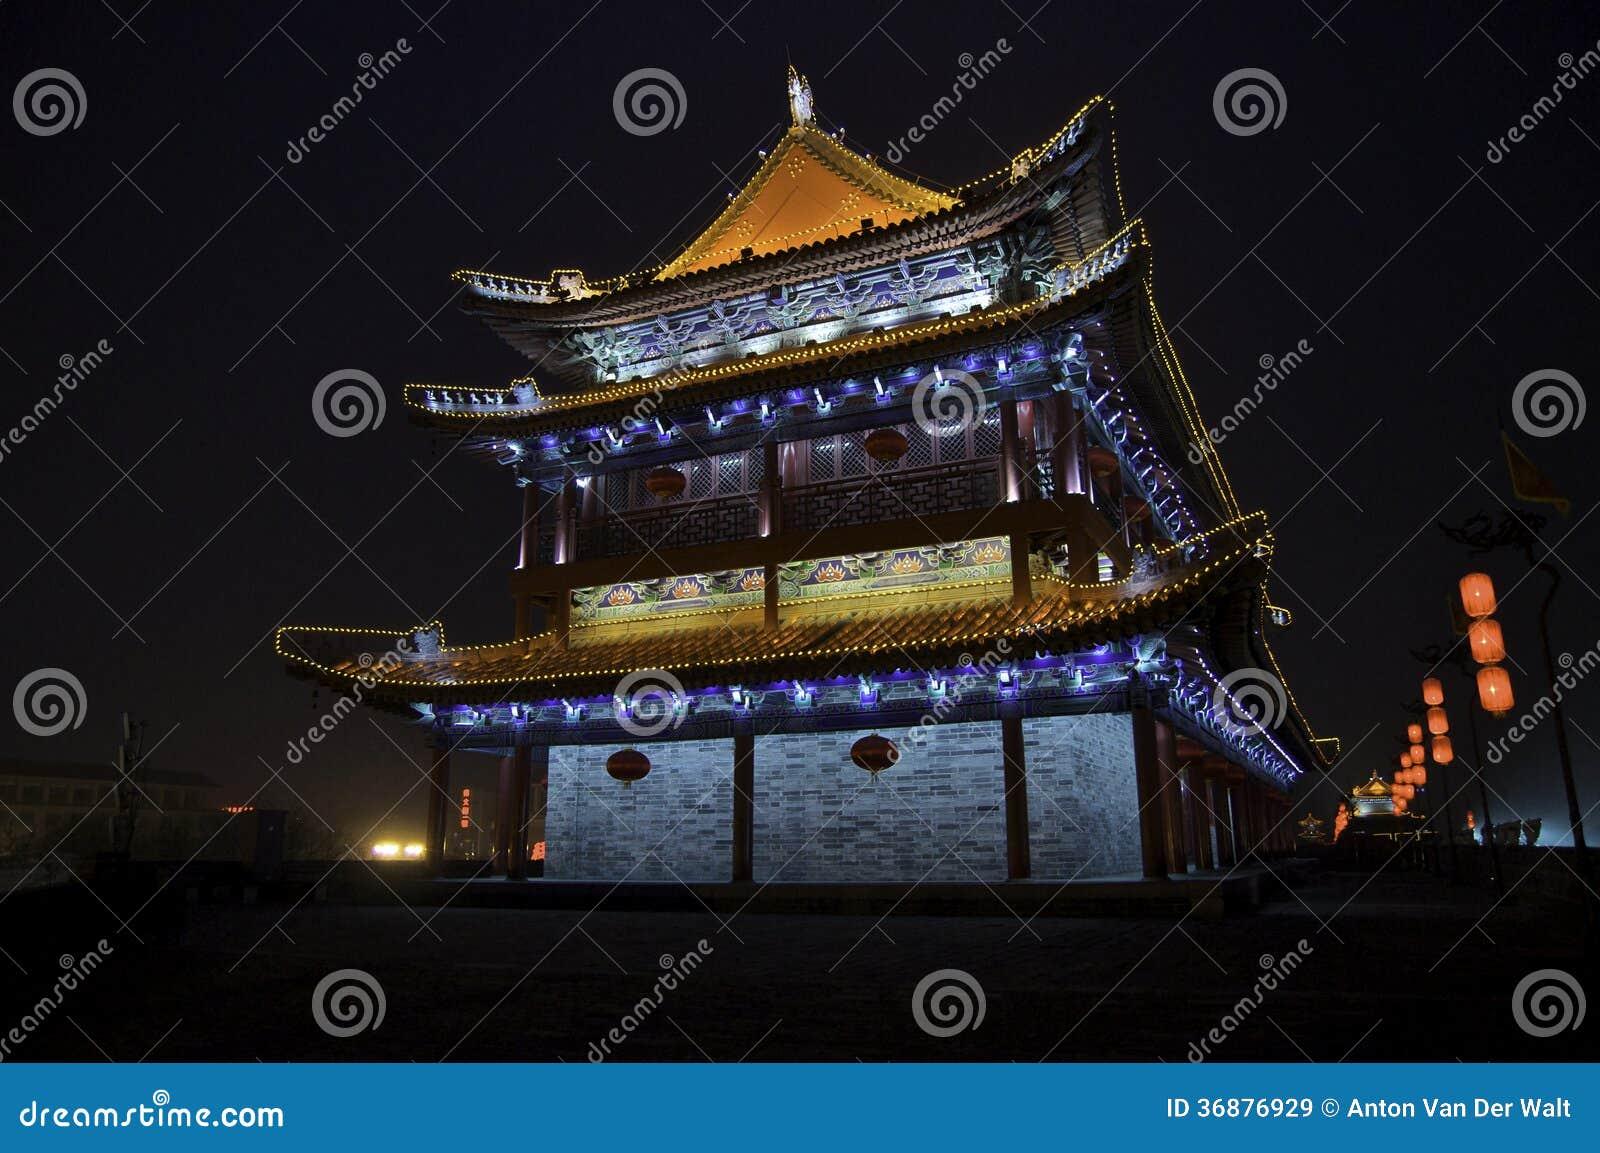 Download Vista Di Notte Del Muro Di Cinta Di Xi'an Immagine Stock - Immagine di coltura, destinazioni: 36876929